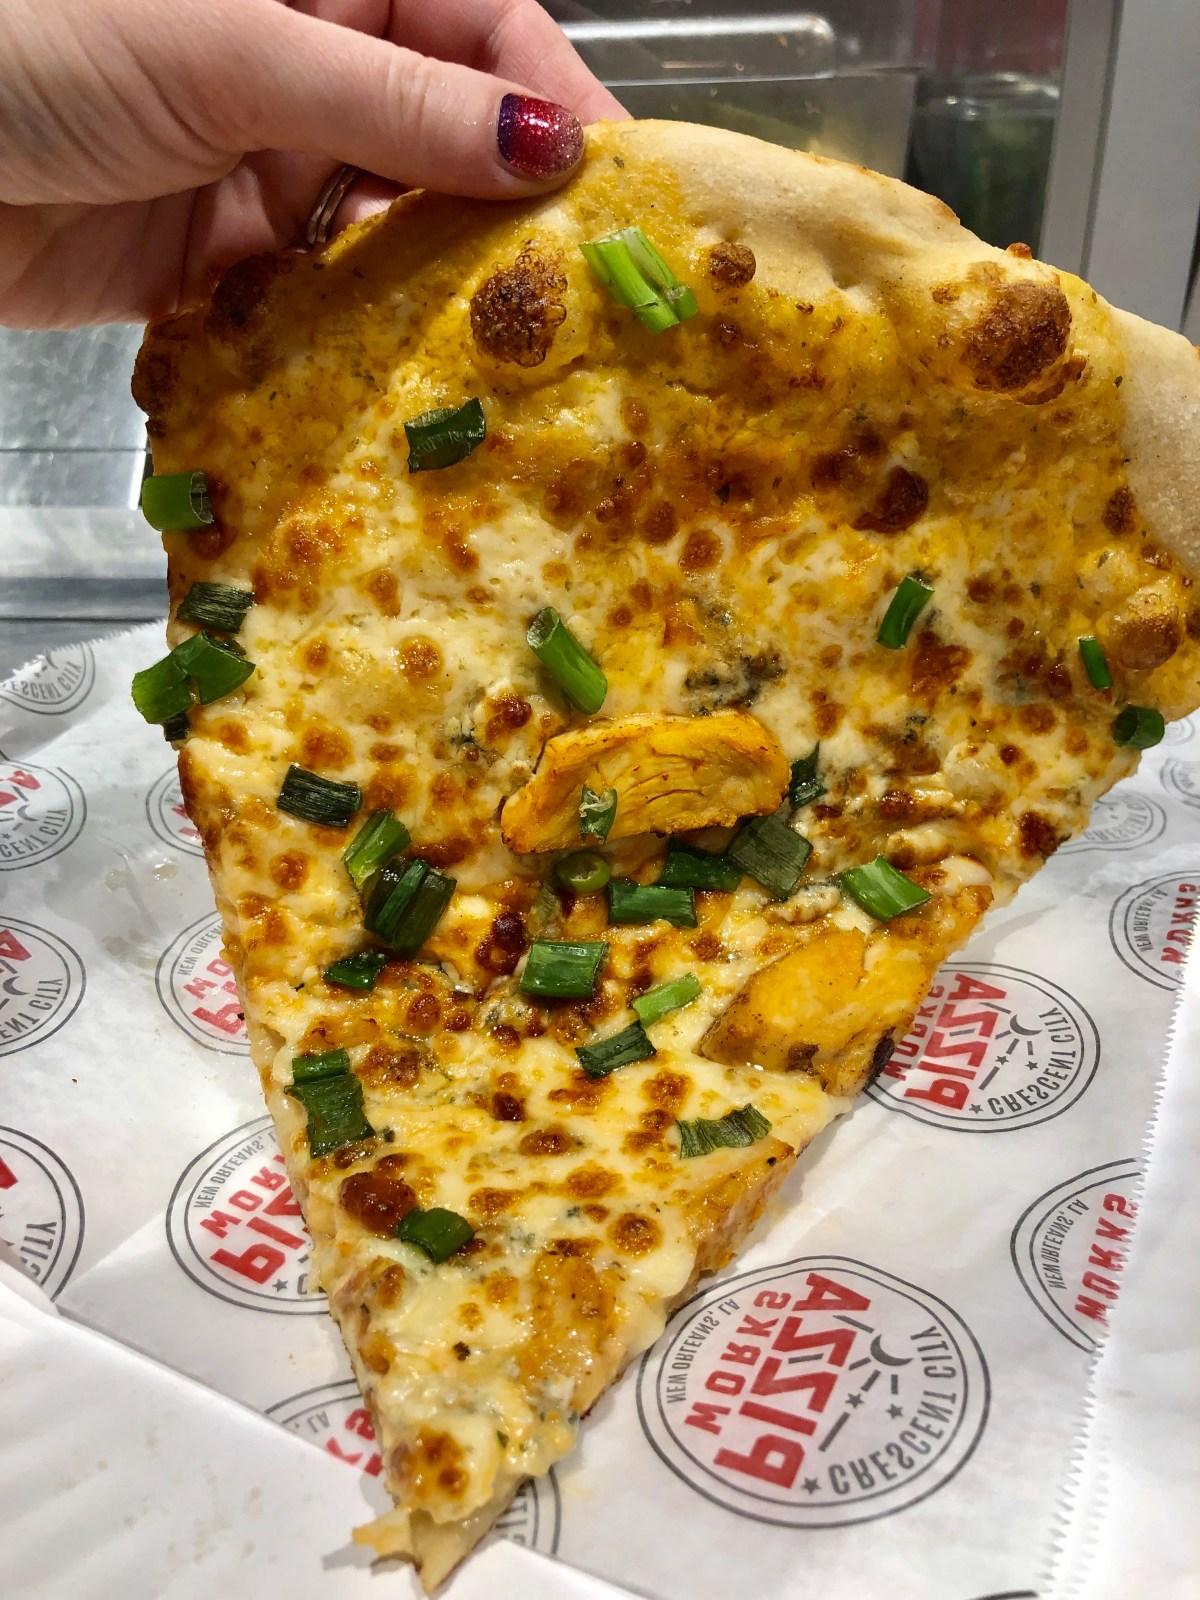 Crescent City PizzaWorks | Bourbon Street #bourbonstreet #frenchquarter #nola #neworleans #whattoeatinneworleans